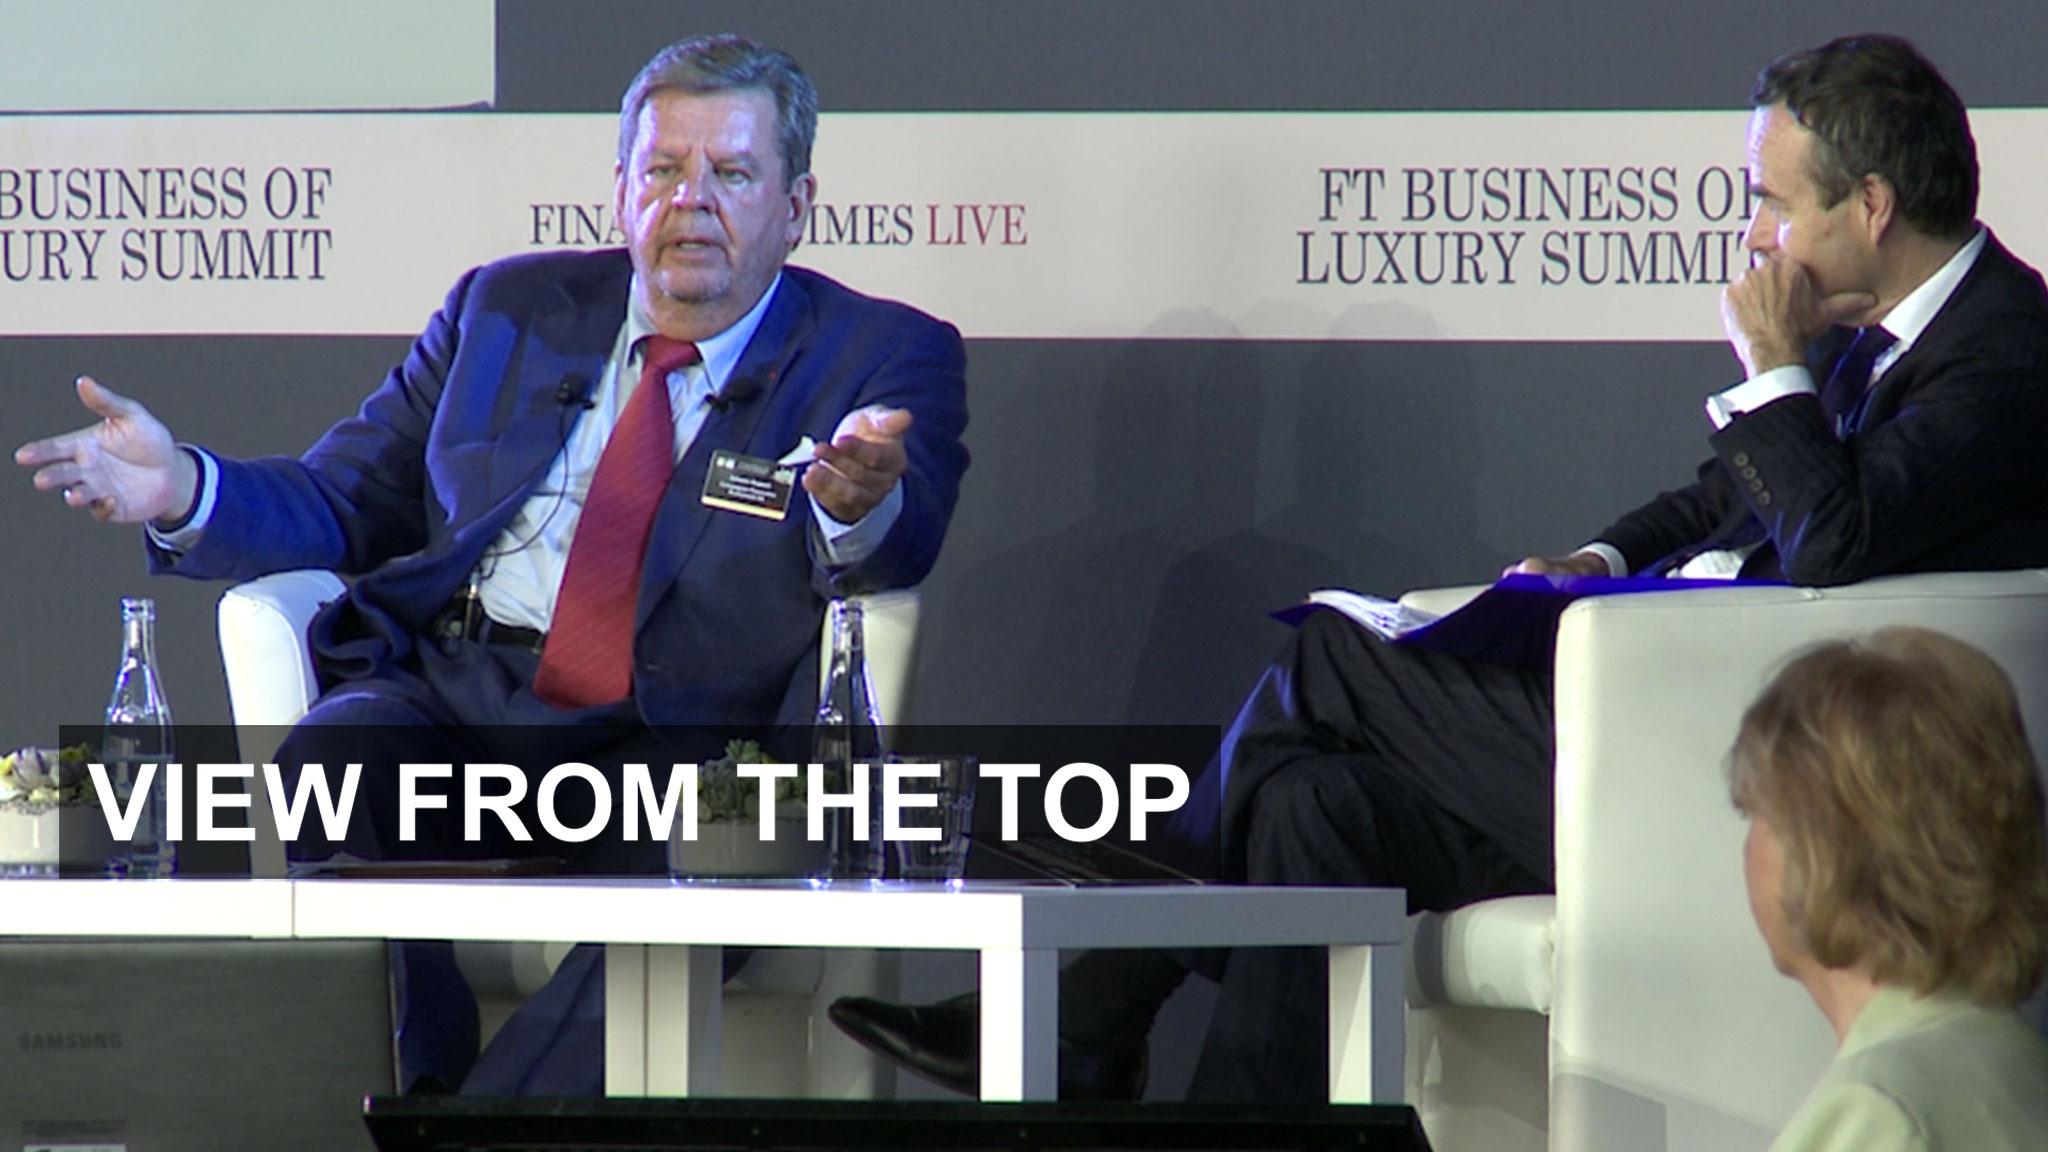 Johann Rupert Financial Times Business of Luxury summit